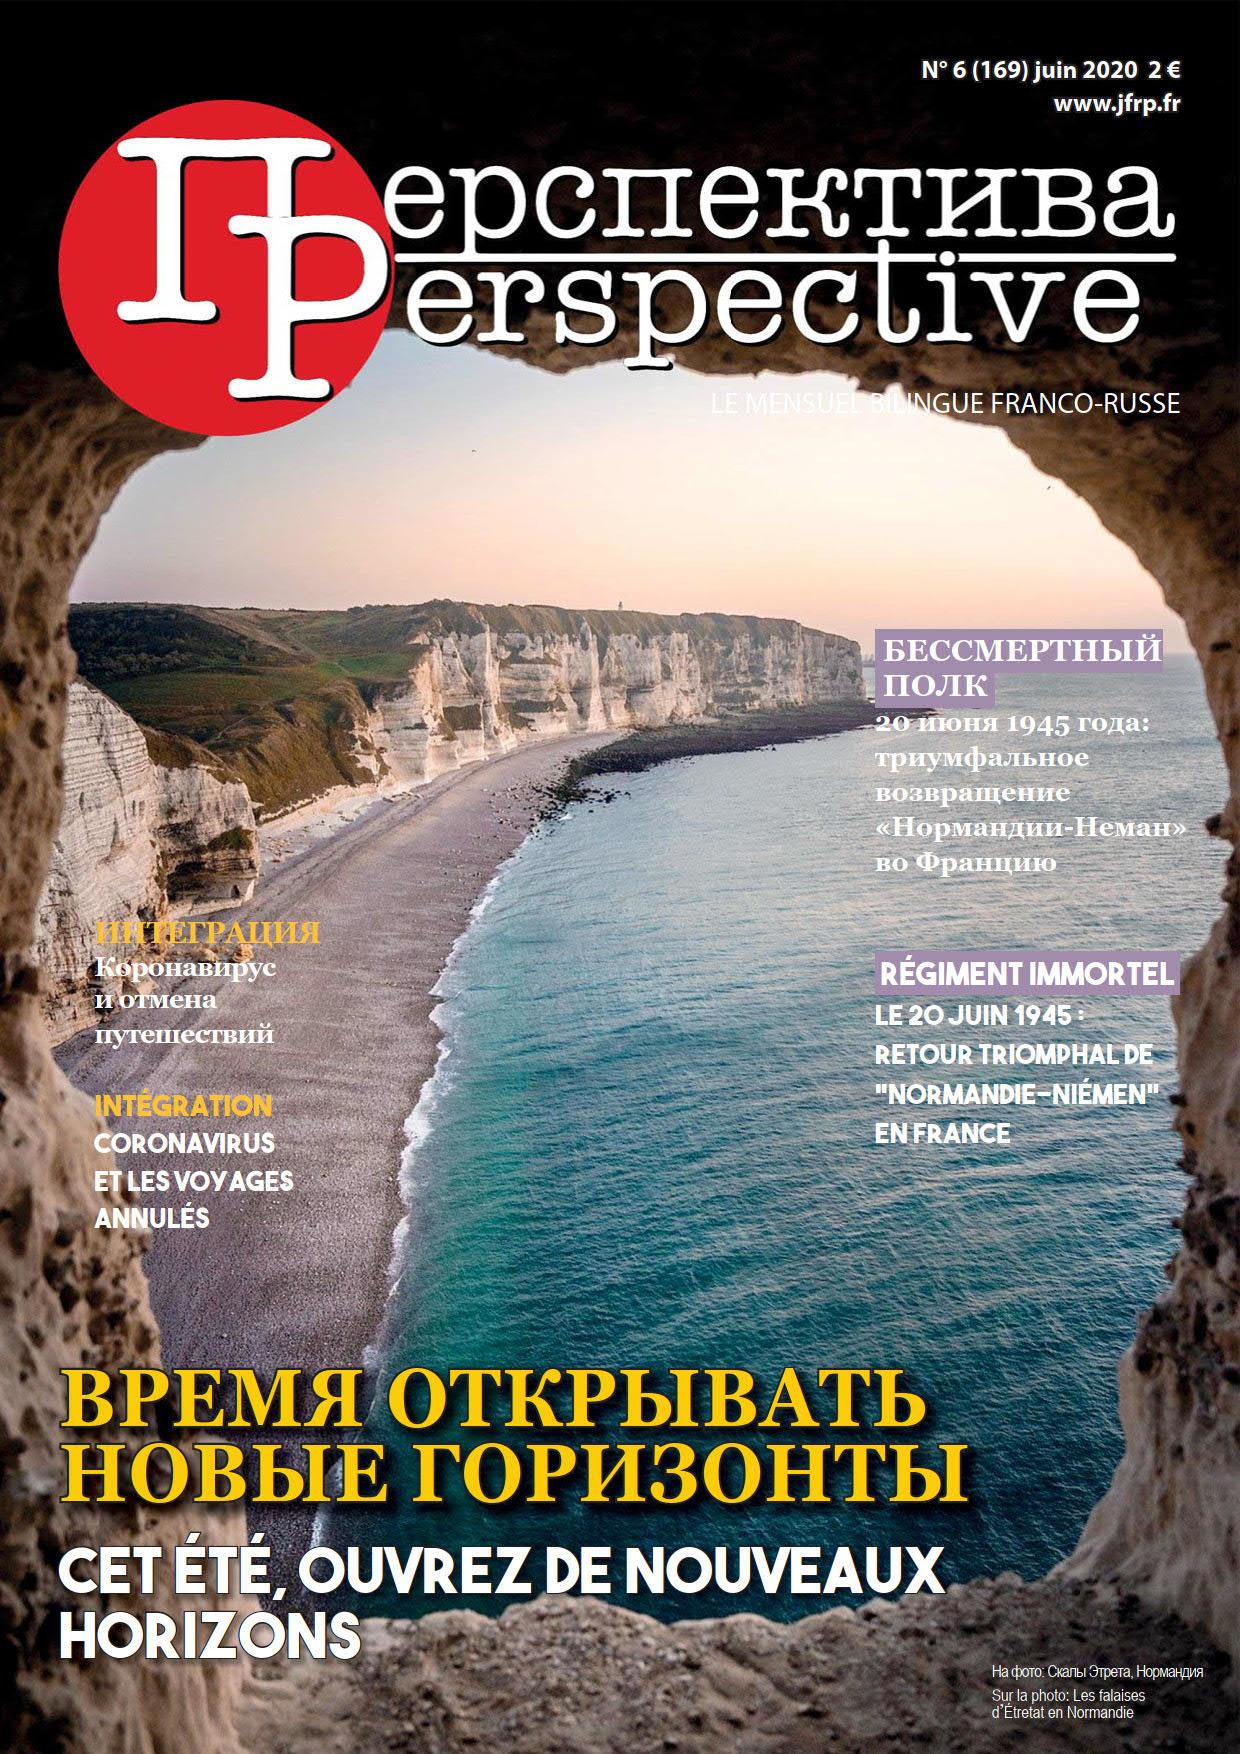 mensuel bilingue franco-russe « Perspective »